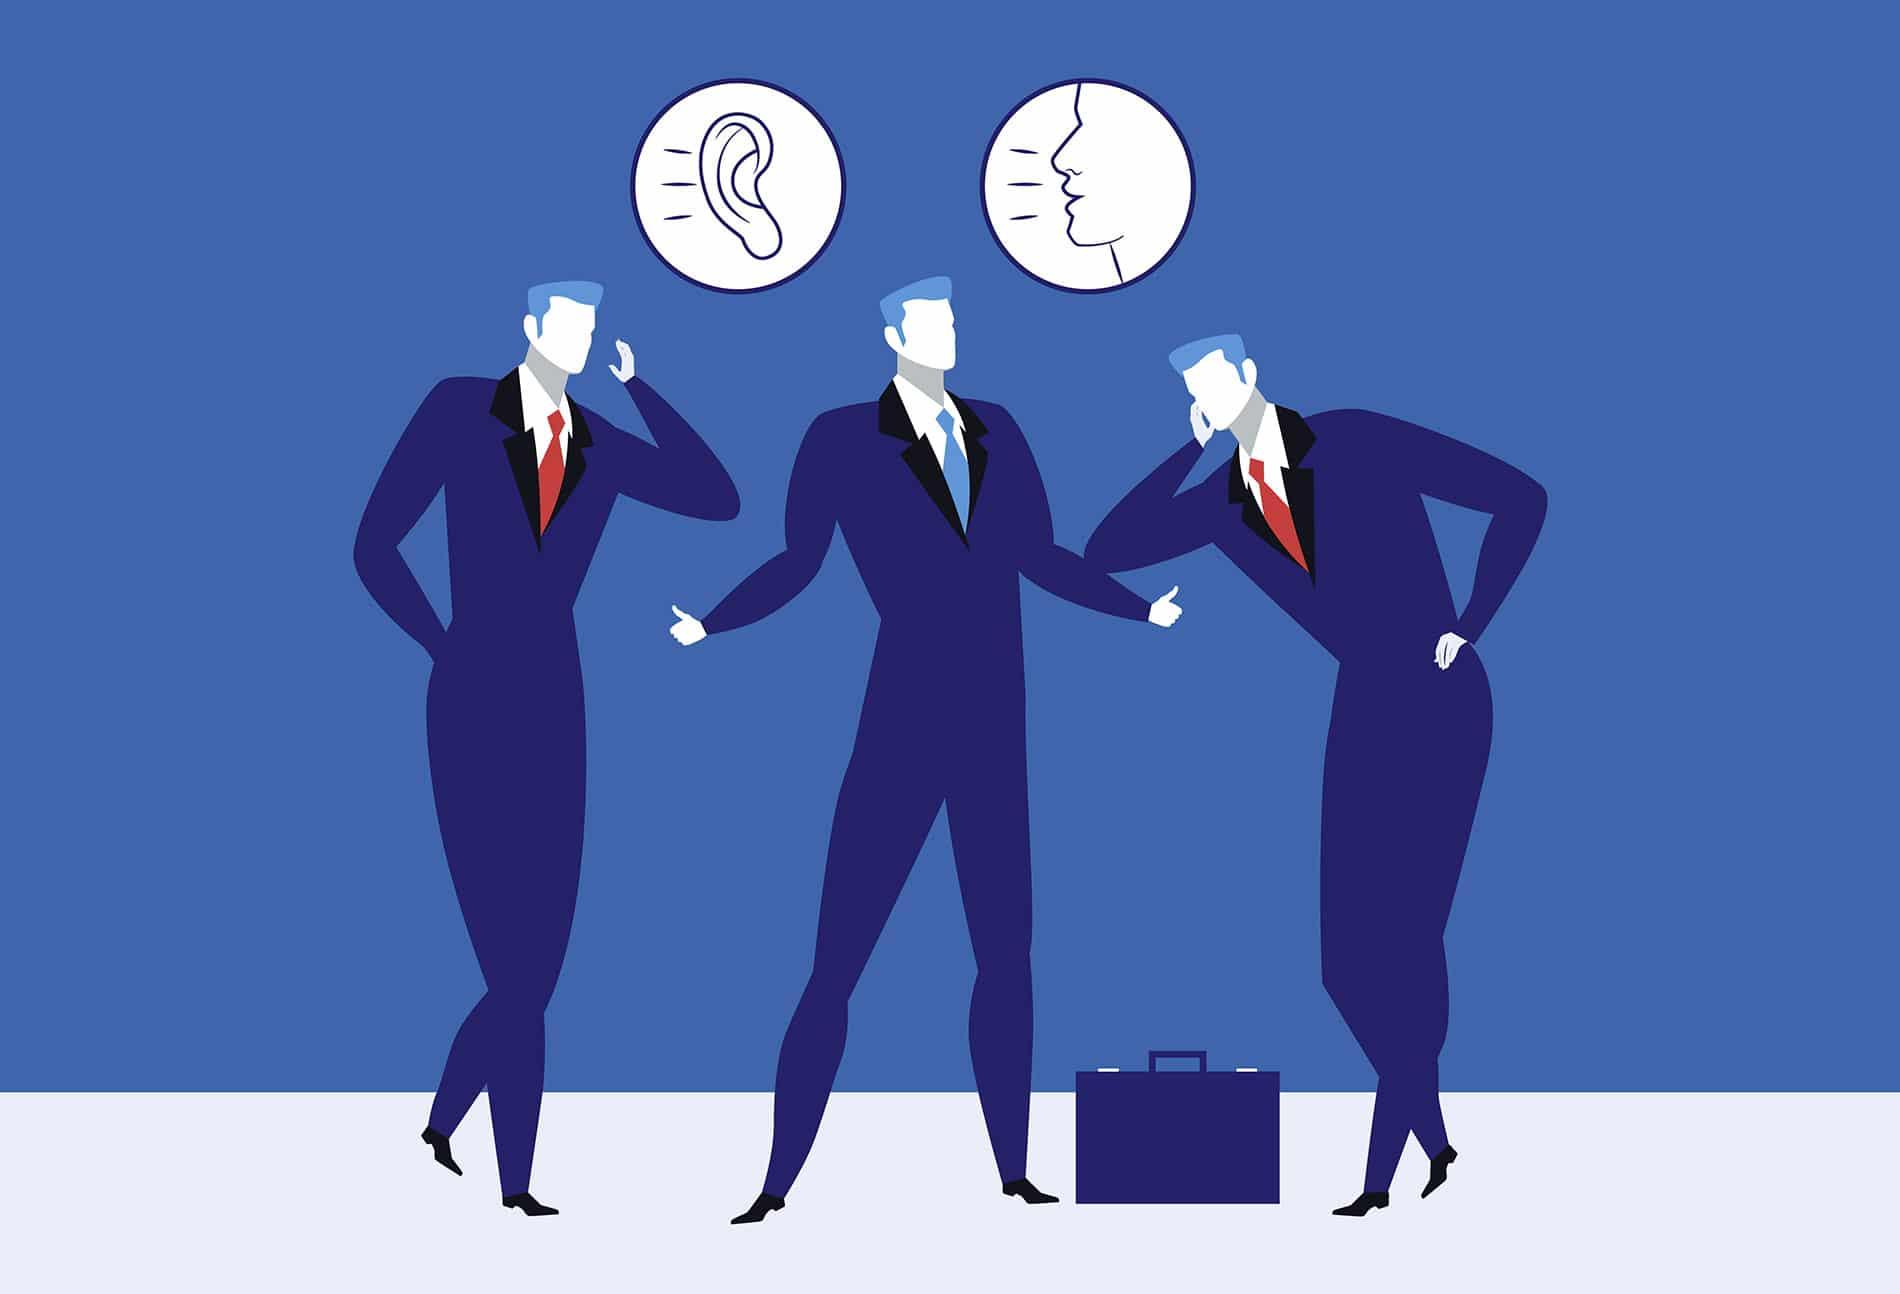 Build communication skills